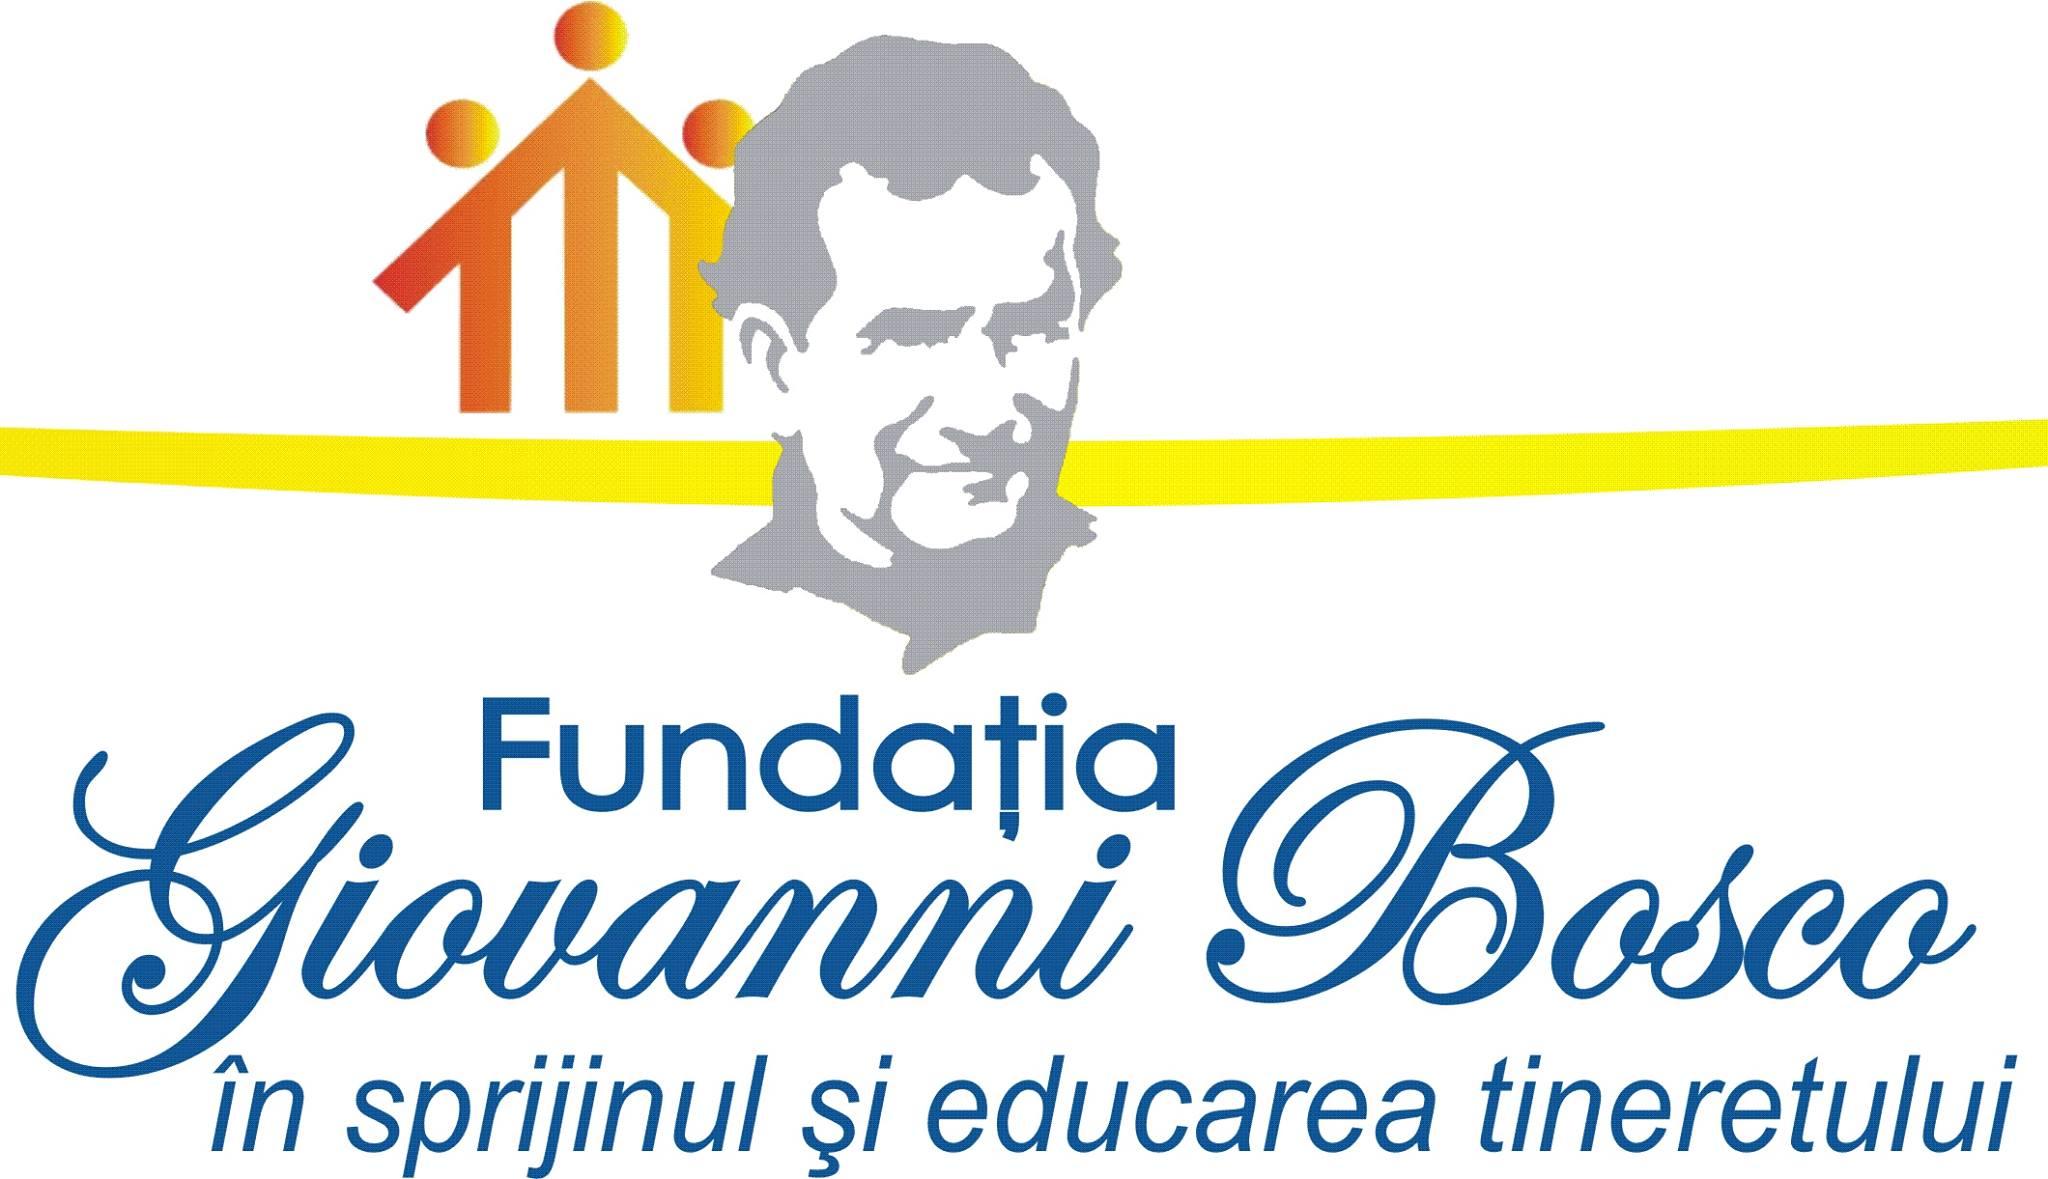 Fundatia Giovani Bosco Constanta